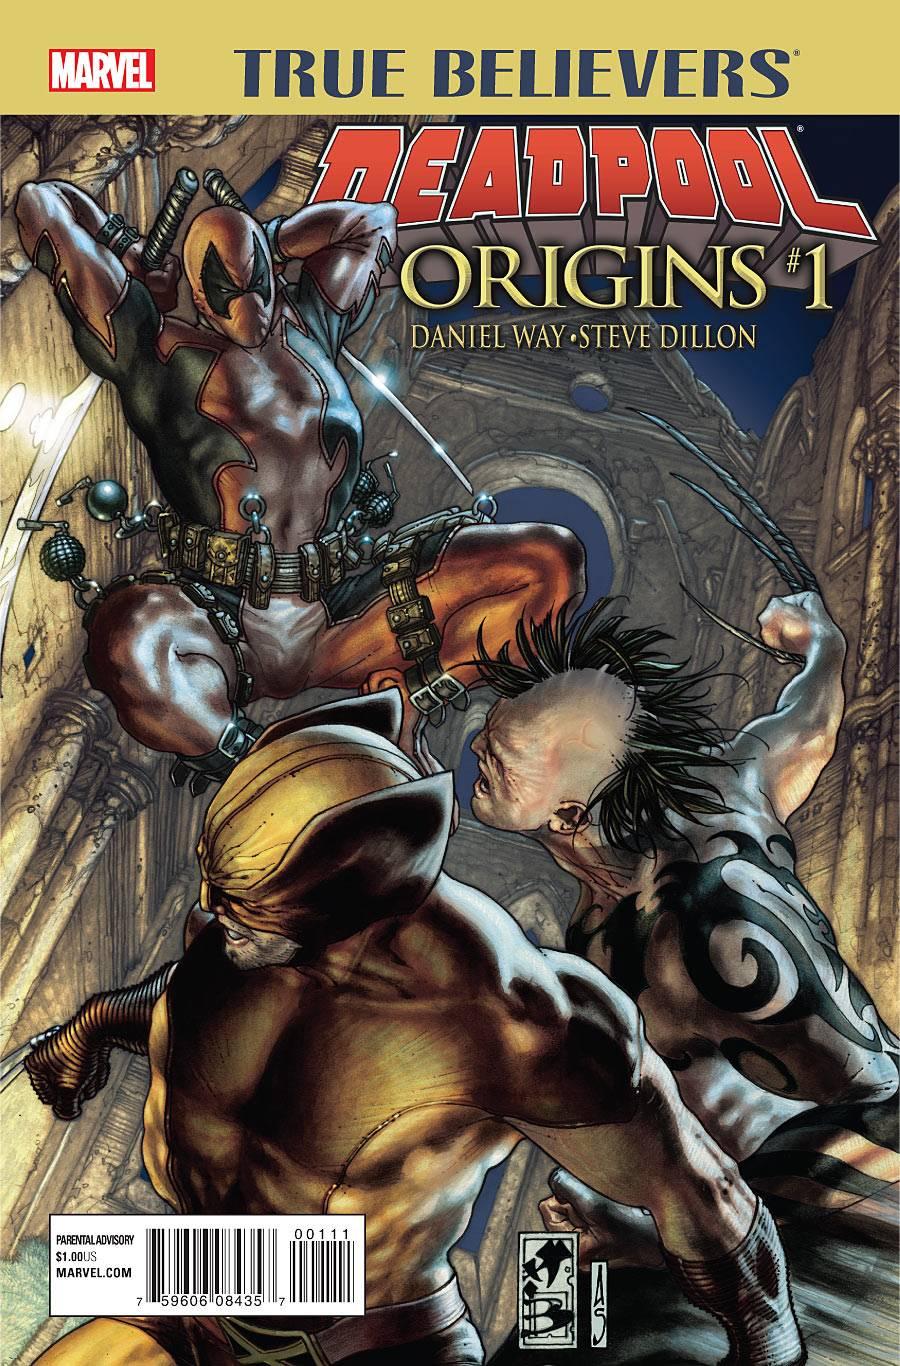 True Believers: Deadpool Origins Vol 1 1